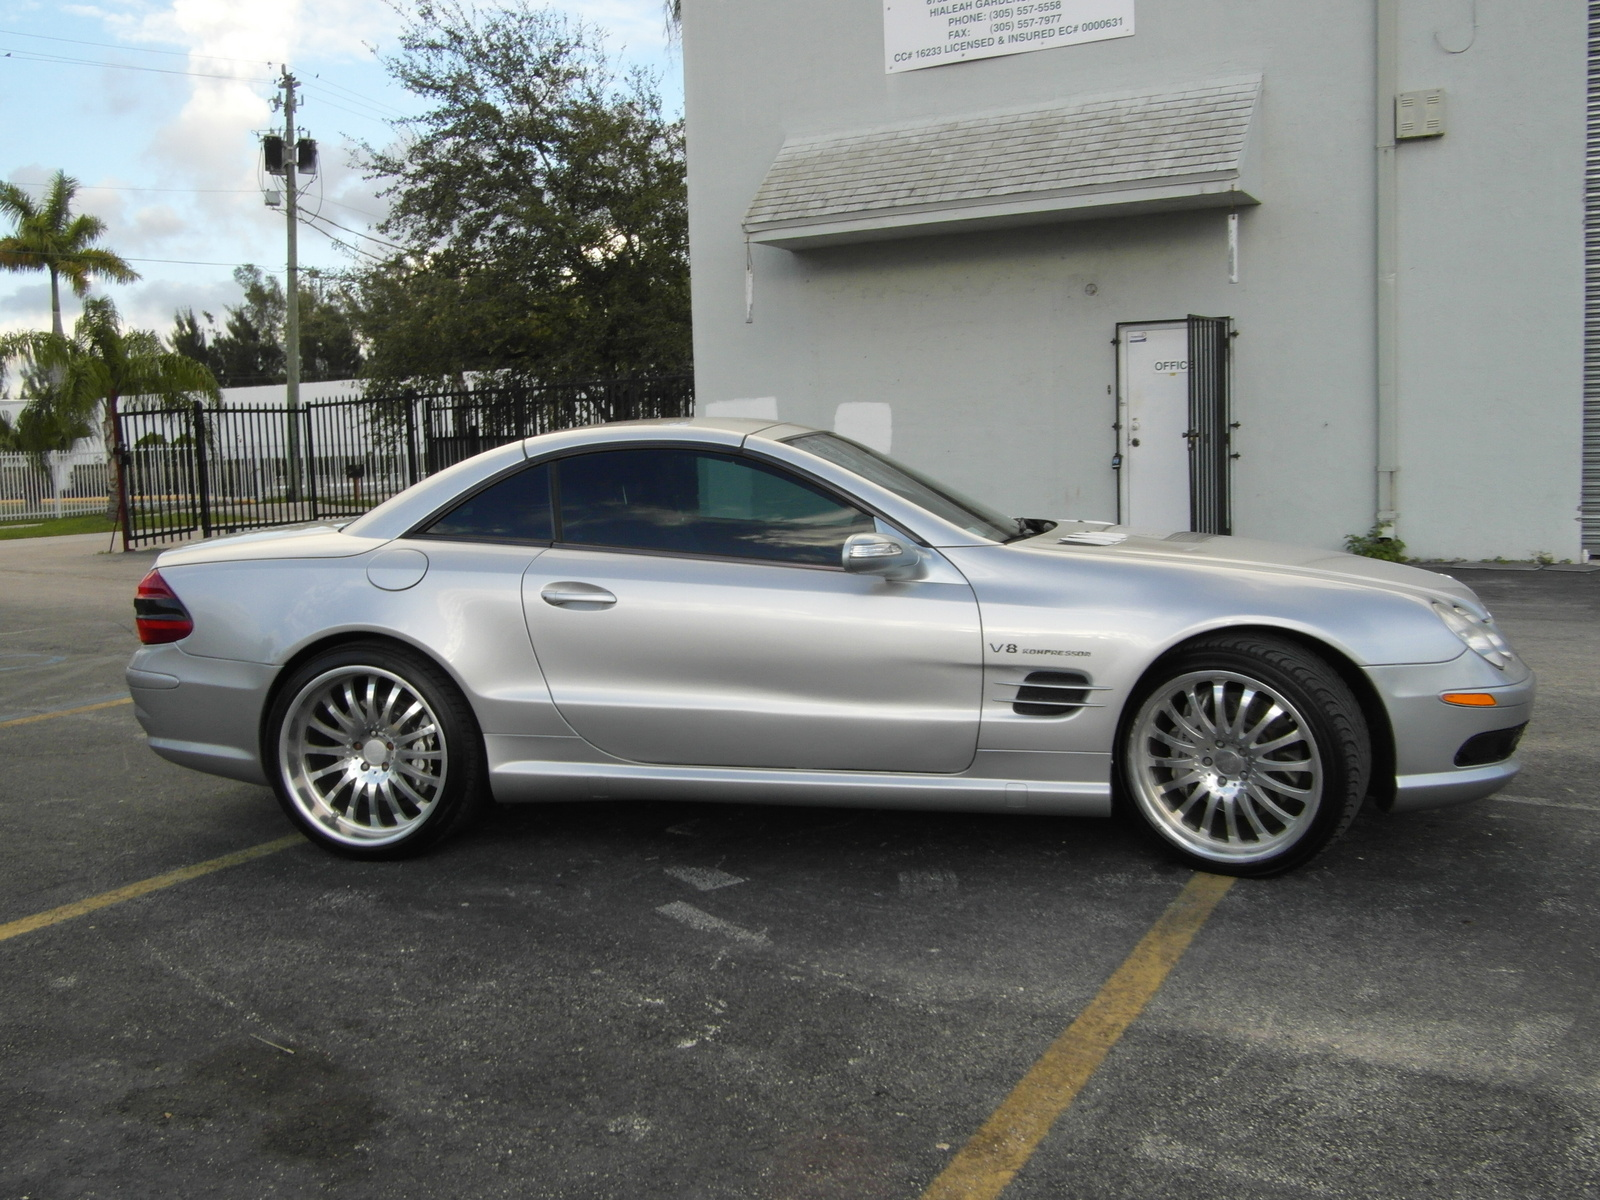 Mercedes benz sl class convertible pictures for 2006 mercedes benz sl55 amg